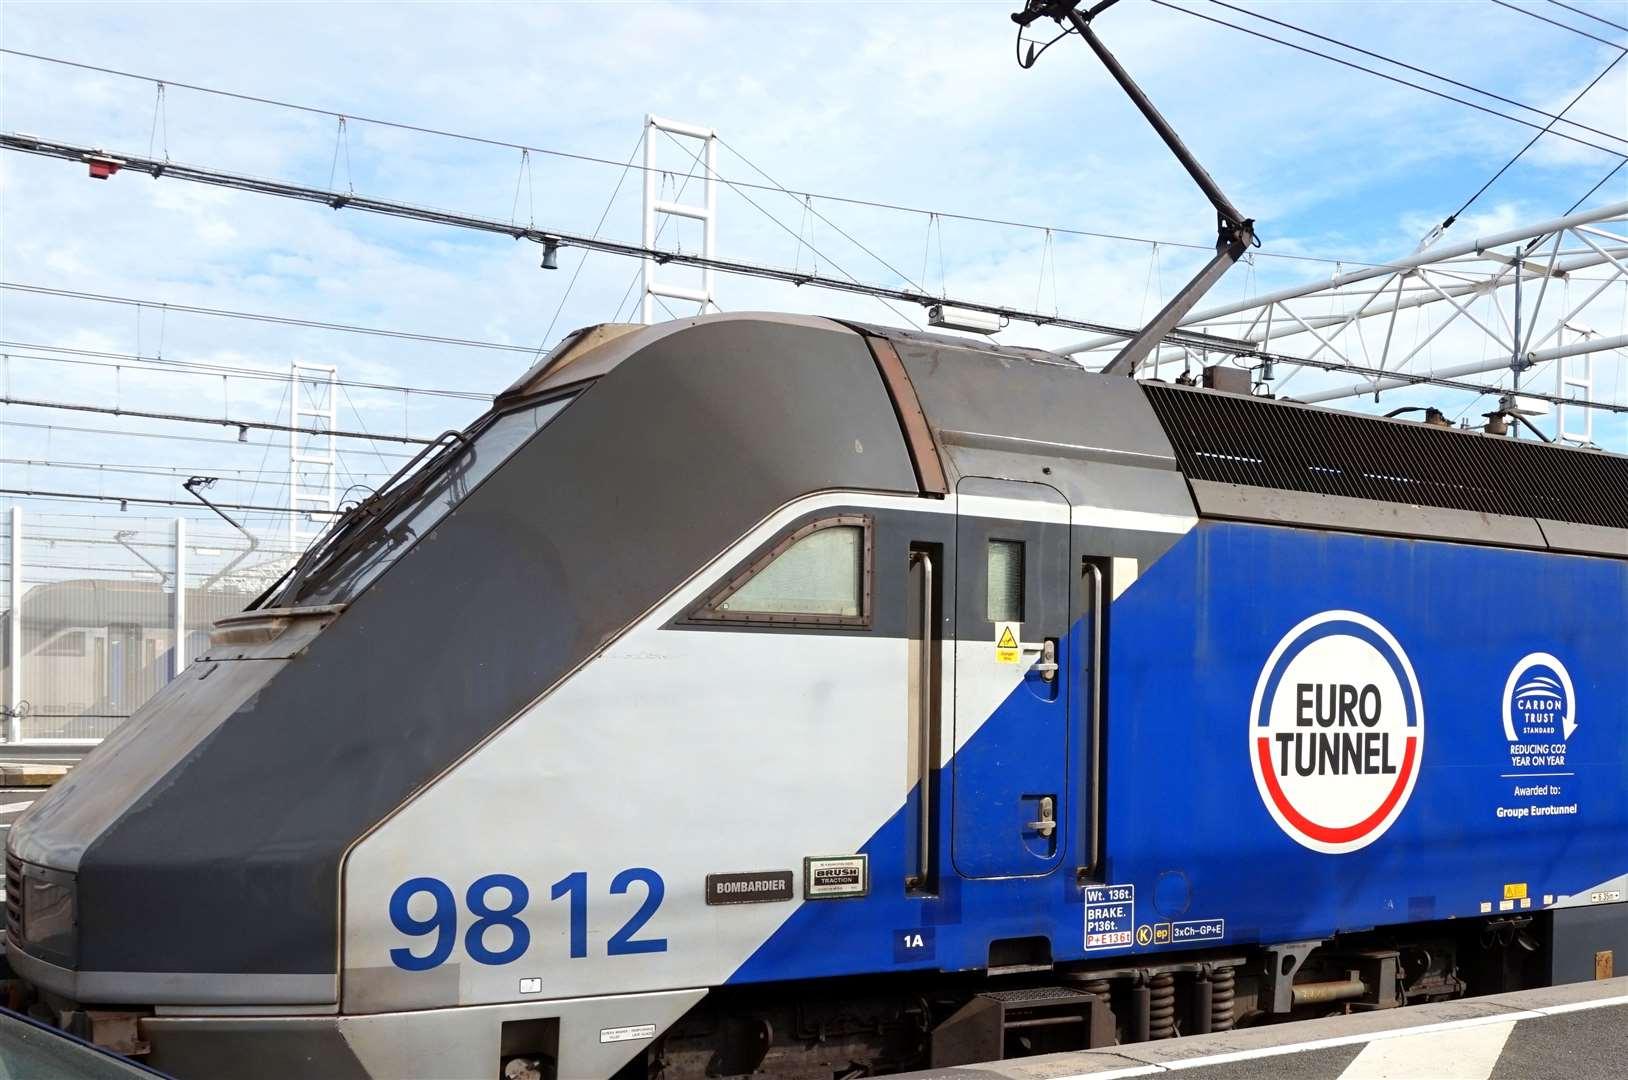 Delays for Eurotunnel passenger services at Folkestone